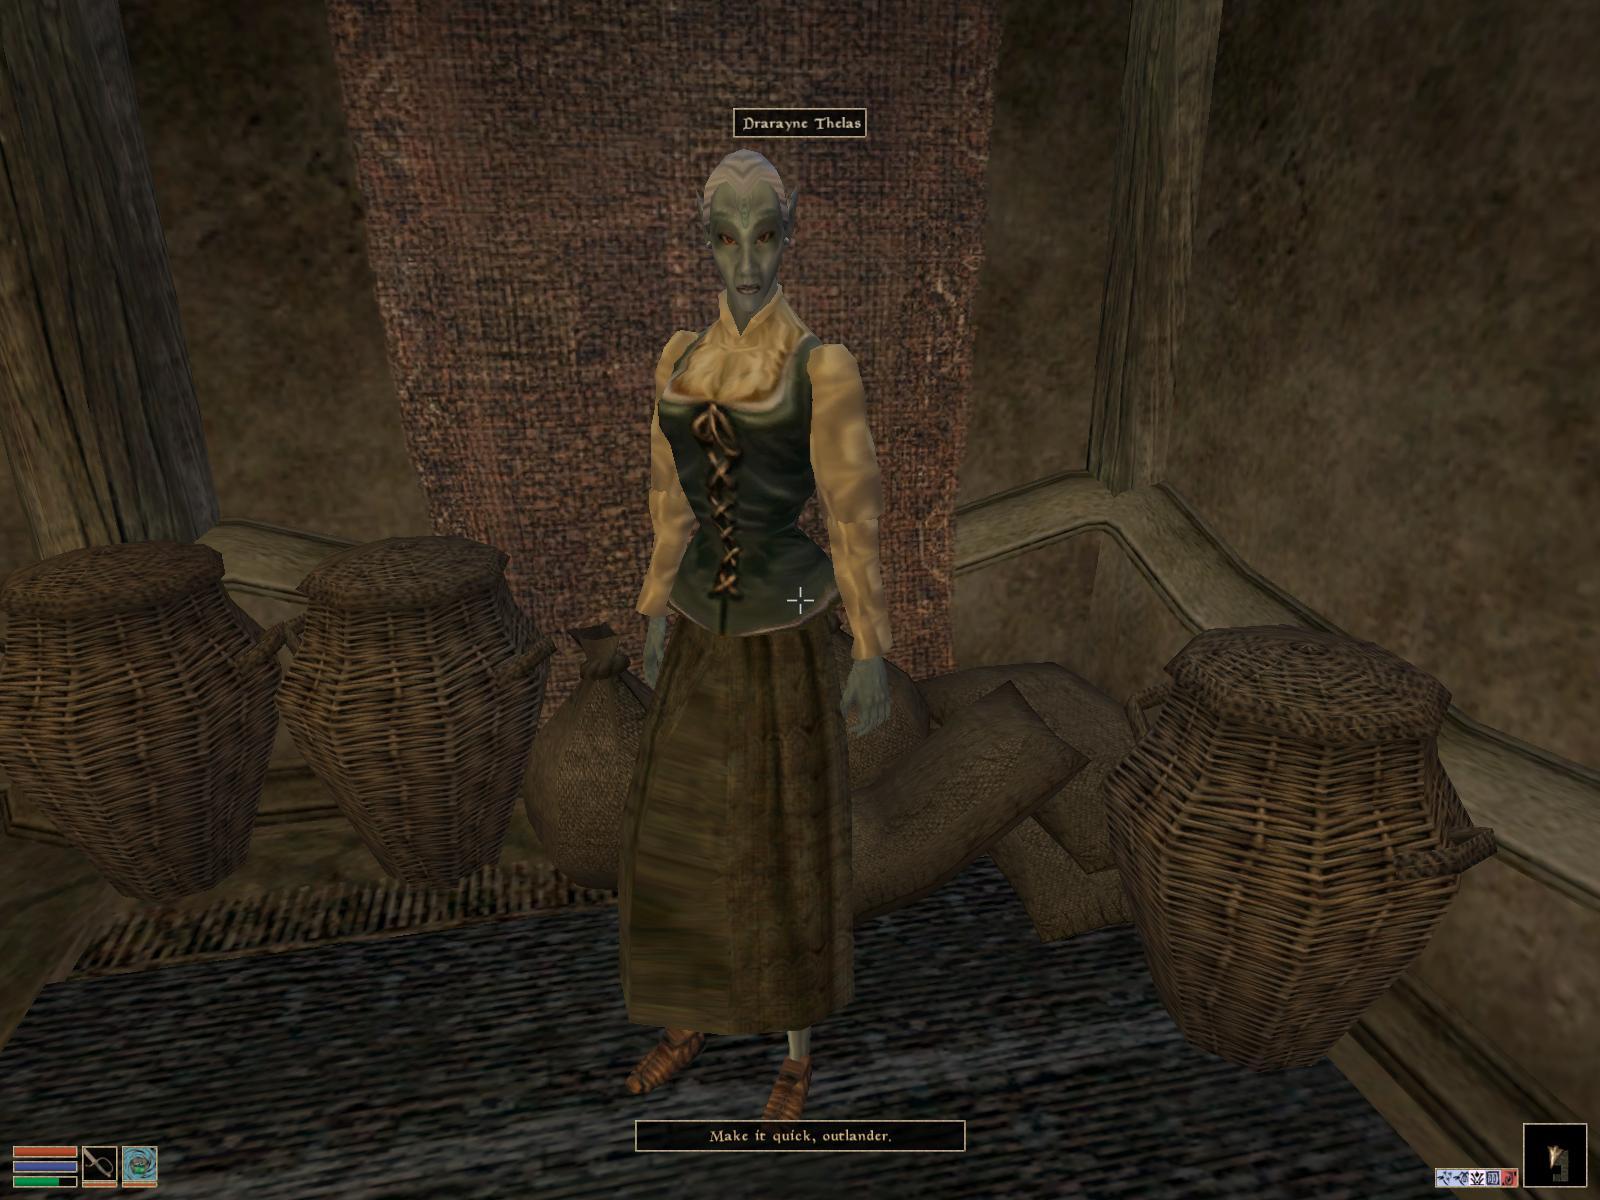 http://4.bp.blogspot.com/_IihlvQBAqf0/TU89cQ9JK-I/AAAAAAAAAQ8/imXhOxZv6f8/s1600/Morrowind+2011-02-06+18-55-48-07.jpg